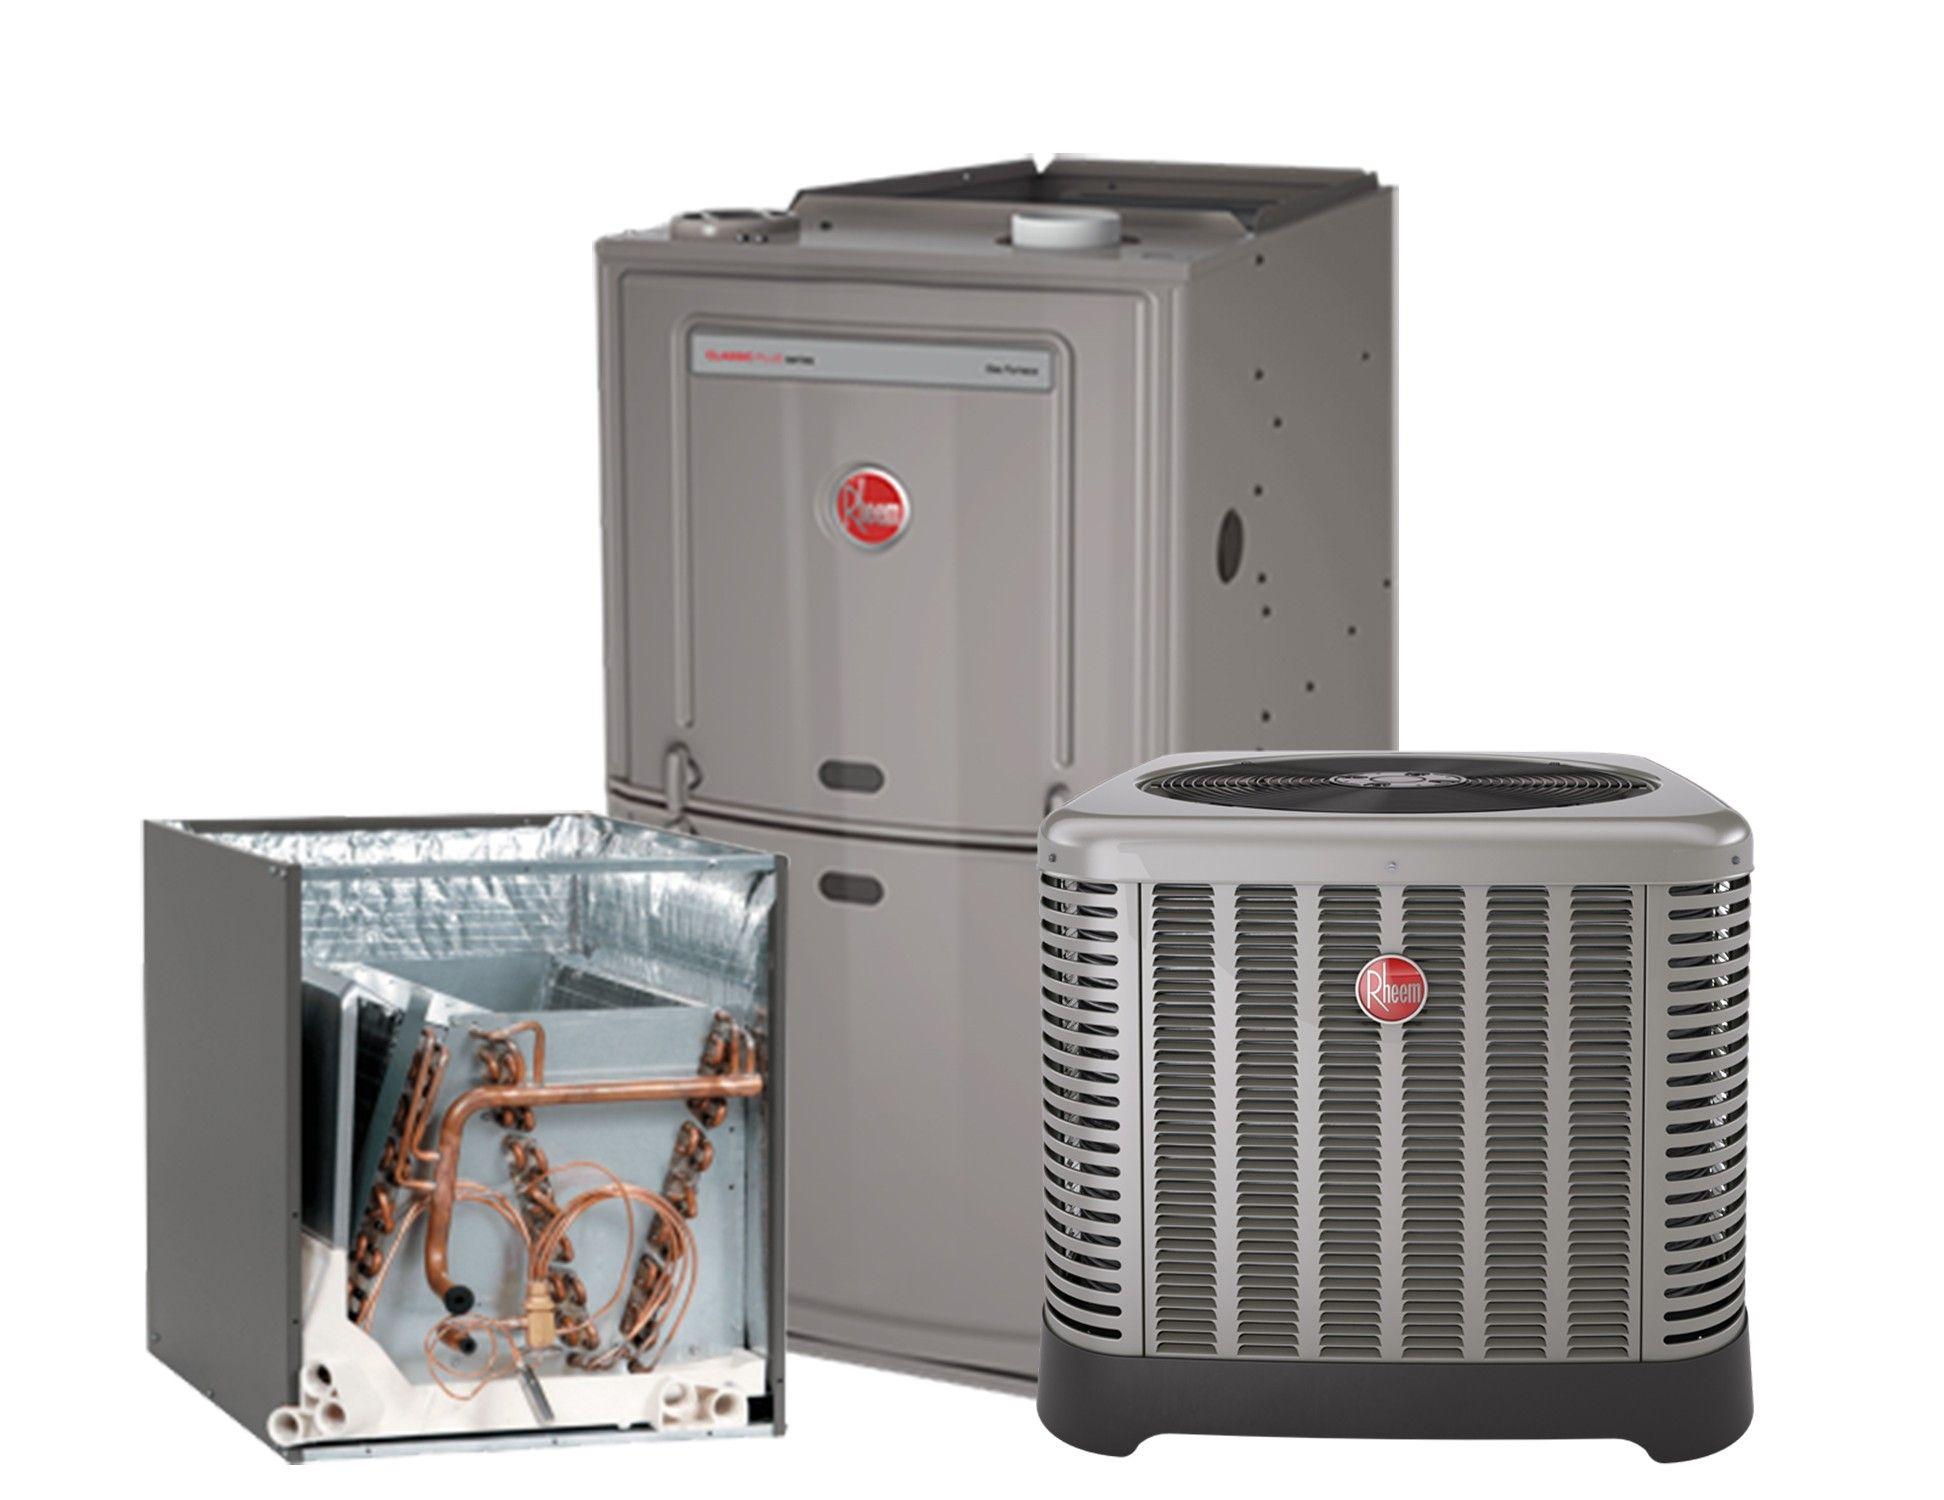 Rheem 1.5 Ton 14 SEER AC system with 80% 50K BTU Natural Gas Furnace